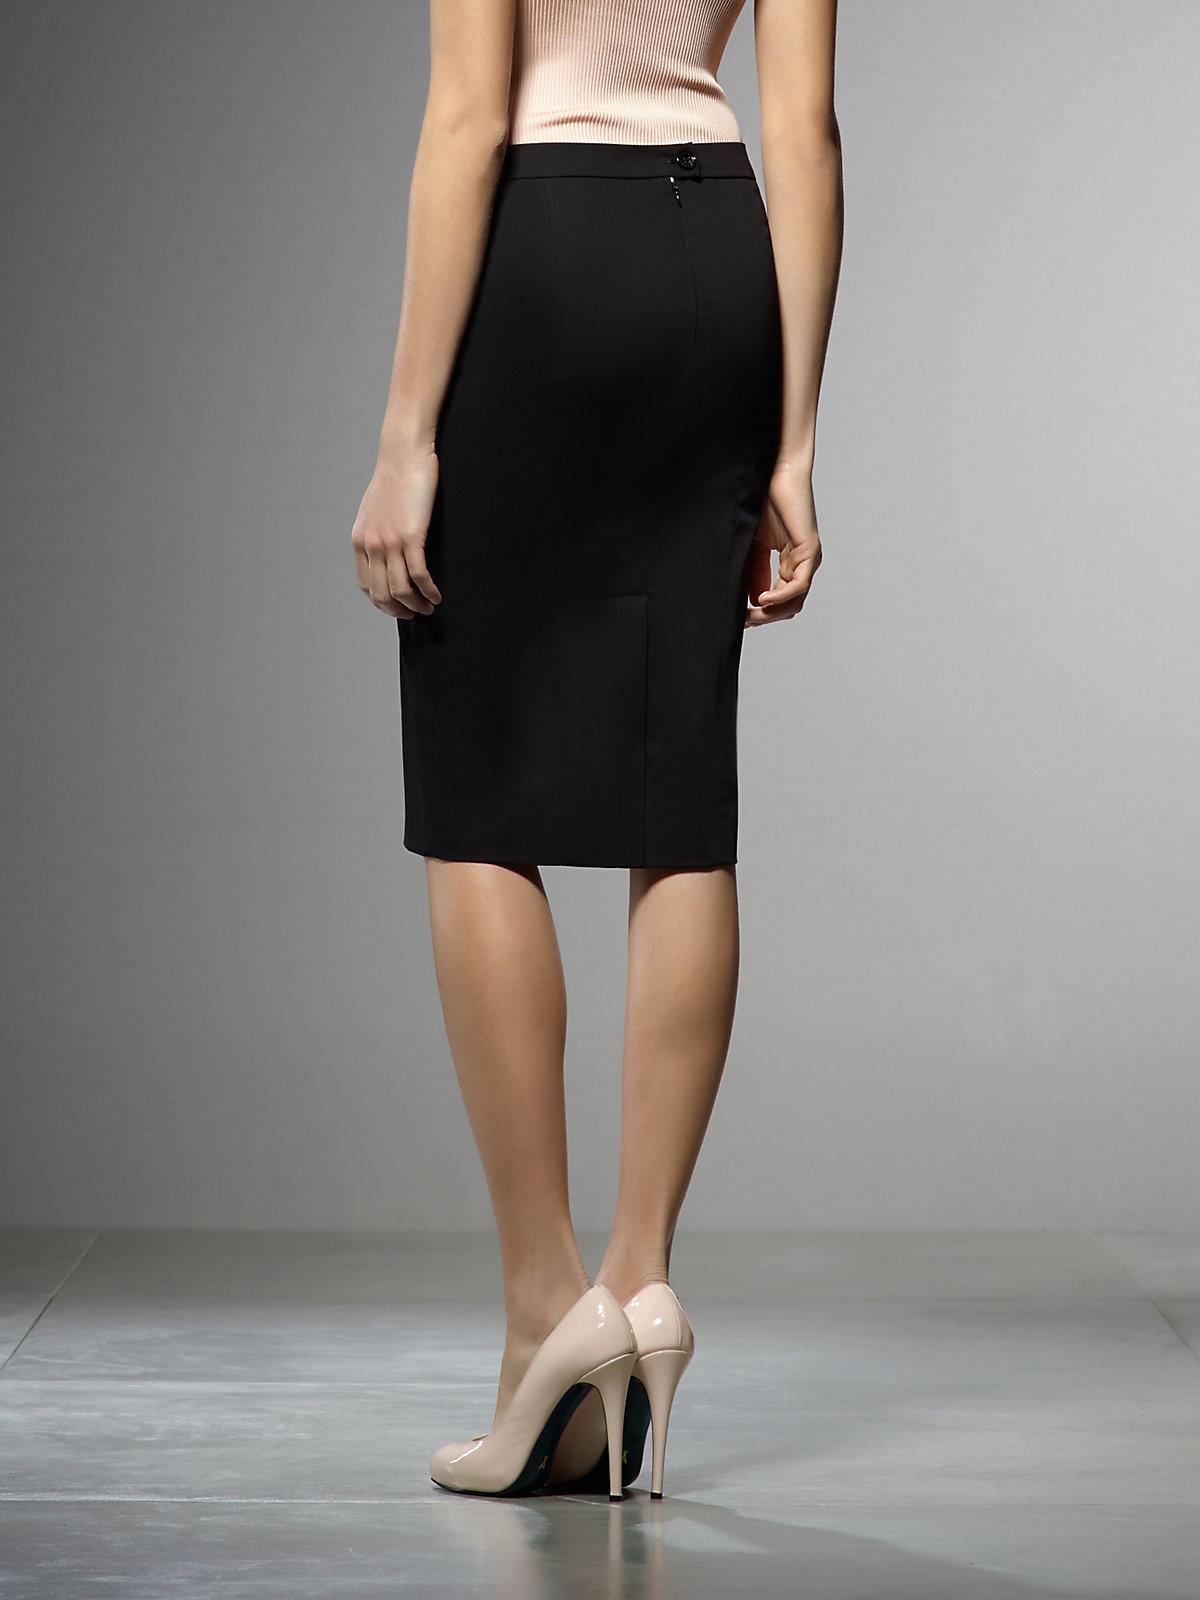 patrizia pepe pencil skirt in cotton stretch gabardine in